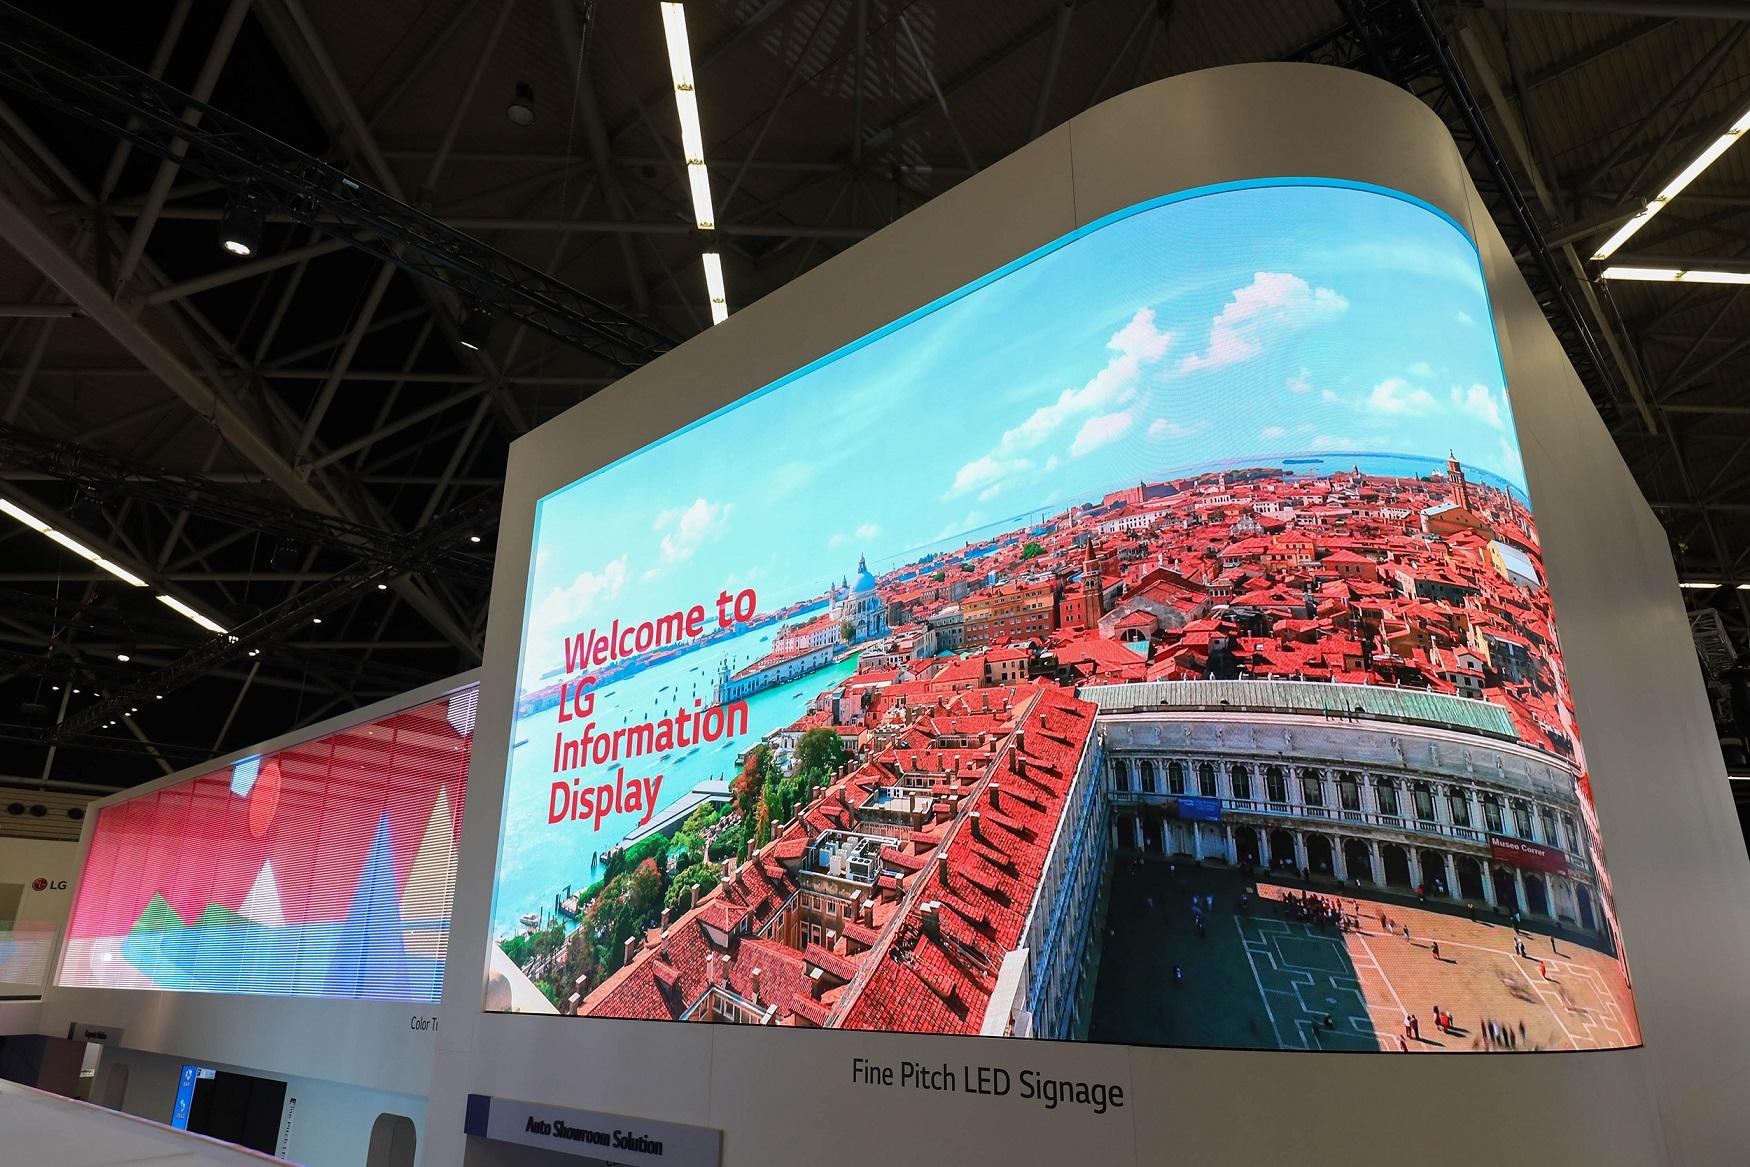 LG전자가 5일(현지시간)부터 4일간 네덜란드 암스테르담에서 열리는 상업용 디스플레이 전시회 'ISE 2019(Integrated Systems Europe 2019)'에서 차세대 사이니지 제품과 다양한 산업 맞춤형 솔루션을 선보였다. '파인피치 LED 사이니지'는 픽셀피치(Pixel Pitch: 픽셀과 픽셀 사이의 간격)가 1.5mm로 촘촘해 픽셀이 도드라지지 않아 선명한 화질을 구현한다. 이 제품은 기존 제품과 달리 전력부가 분리되어 있어 제품을 구부리는 것이 쉽고 다양한 형태로 설치할 수 있다.